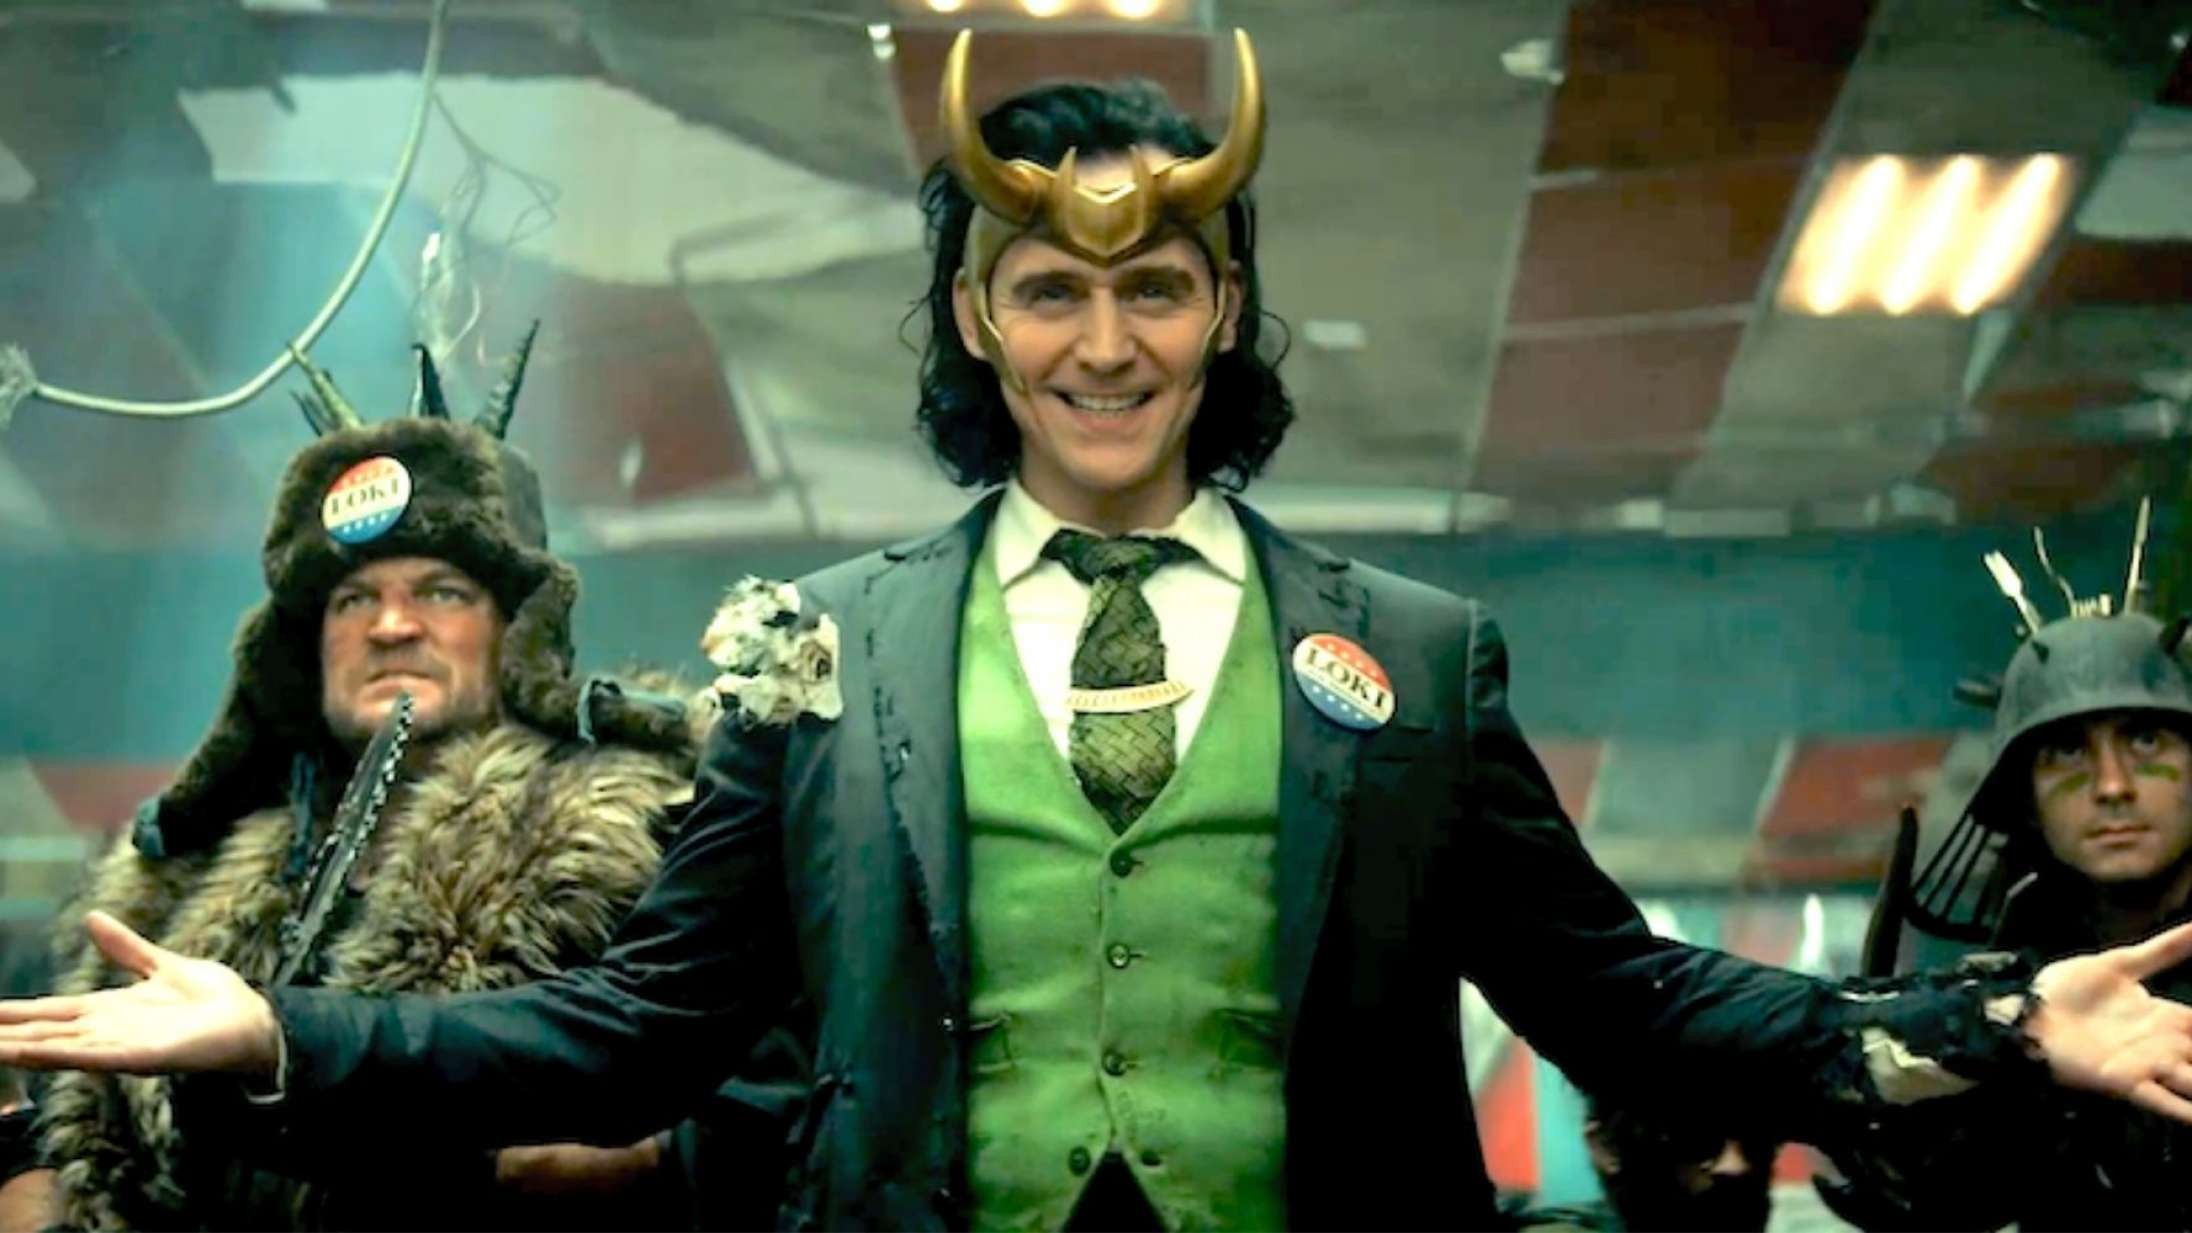 Marvel-serien 'Loki' får premieredato